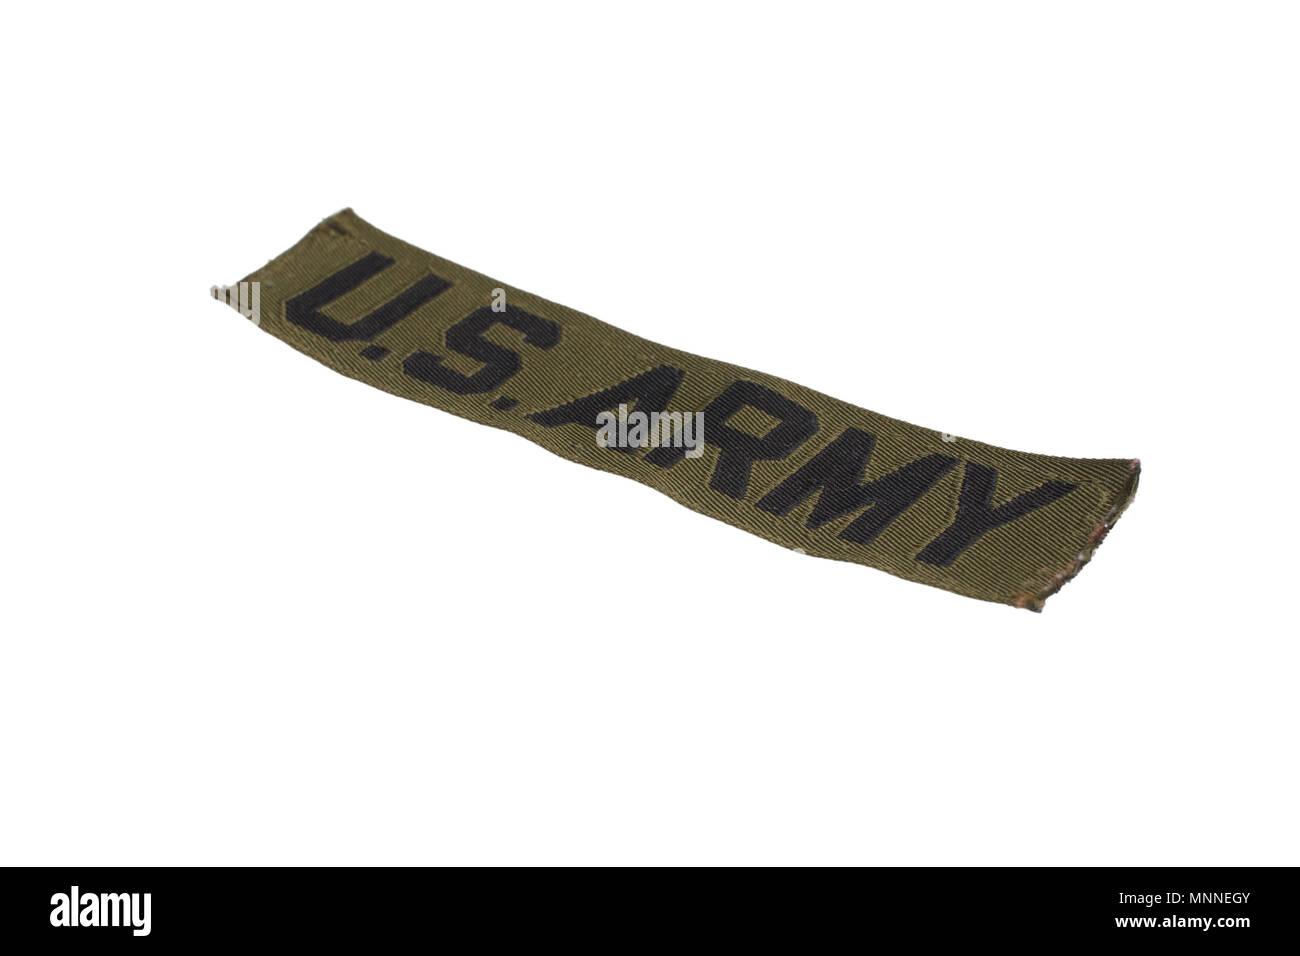 KIEV, UKRAINE - Mar. 29, 2015. Illustrative editorial. US ARMY branch tape uniform badge isolated on white background - Stock Image